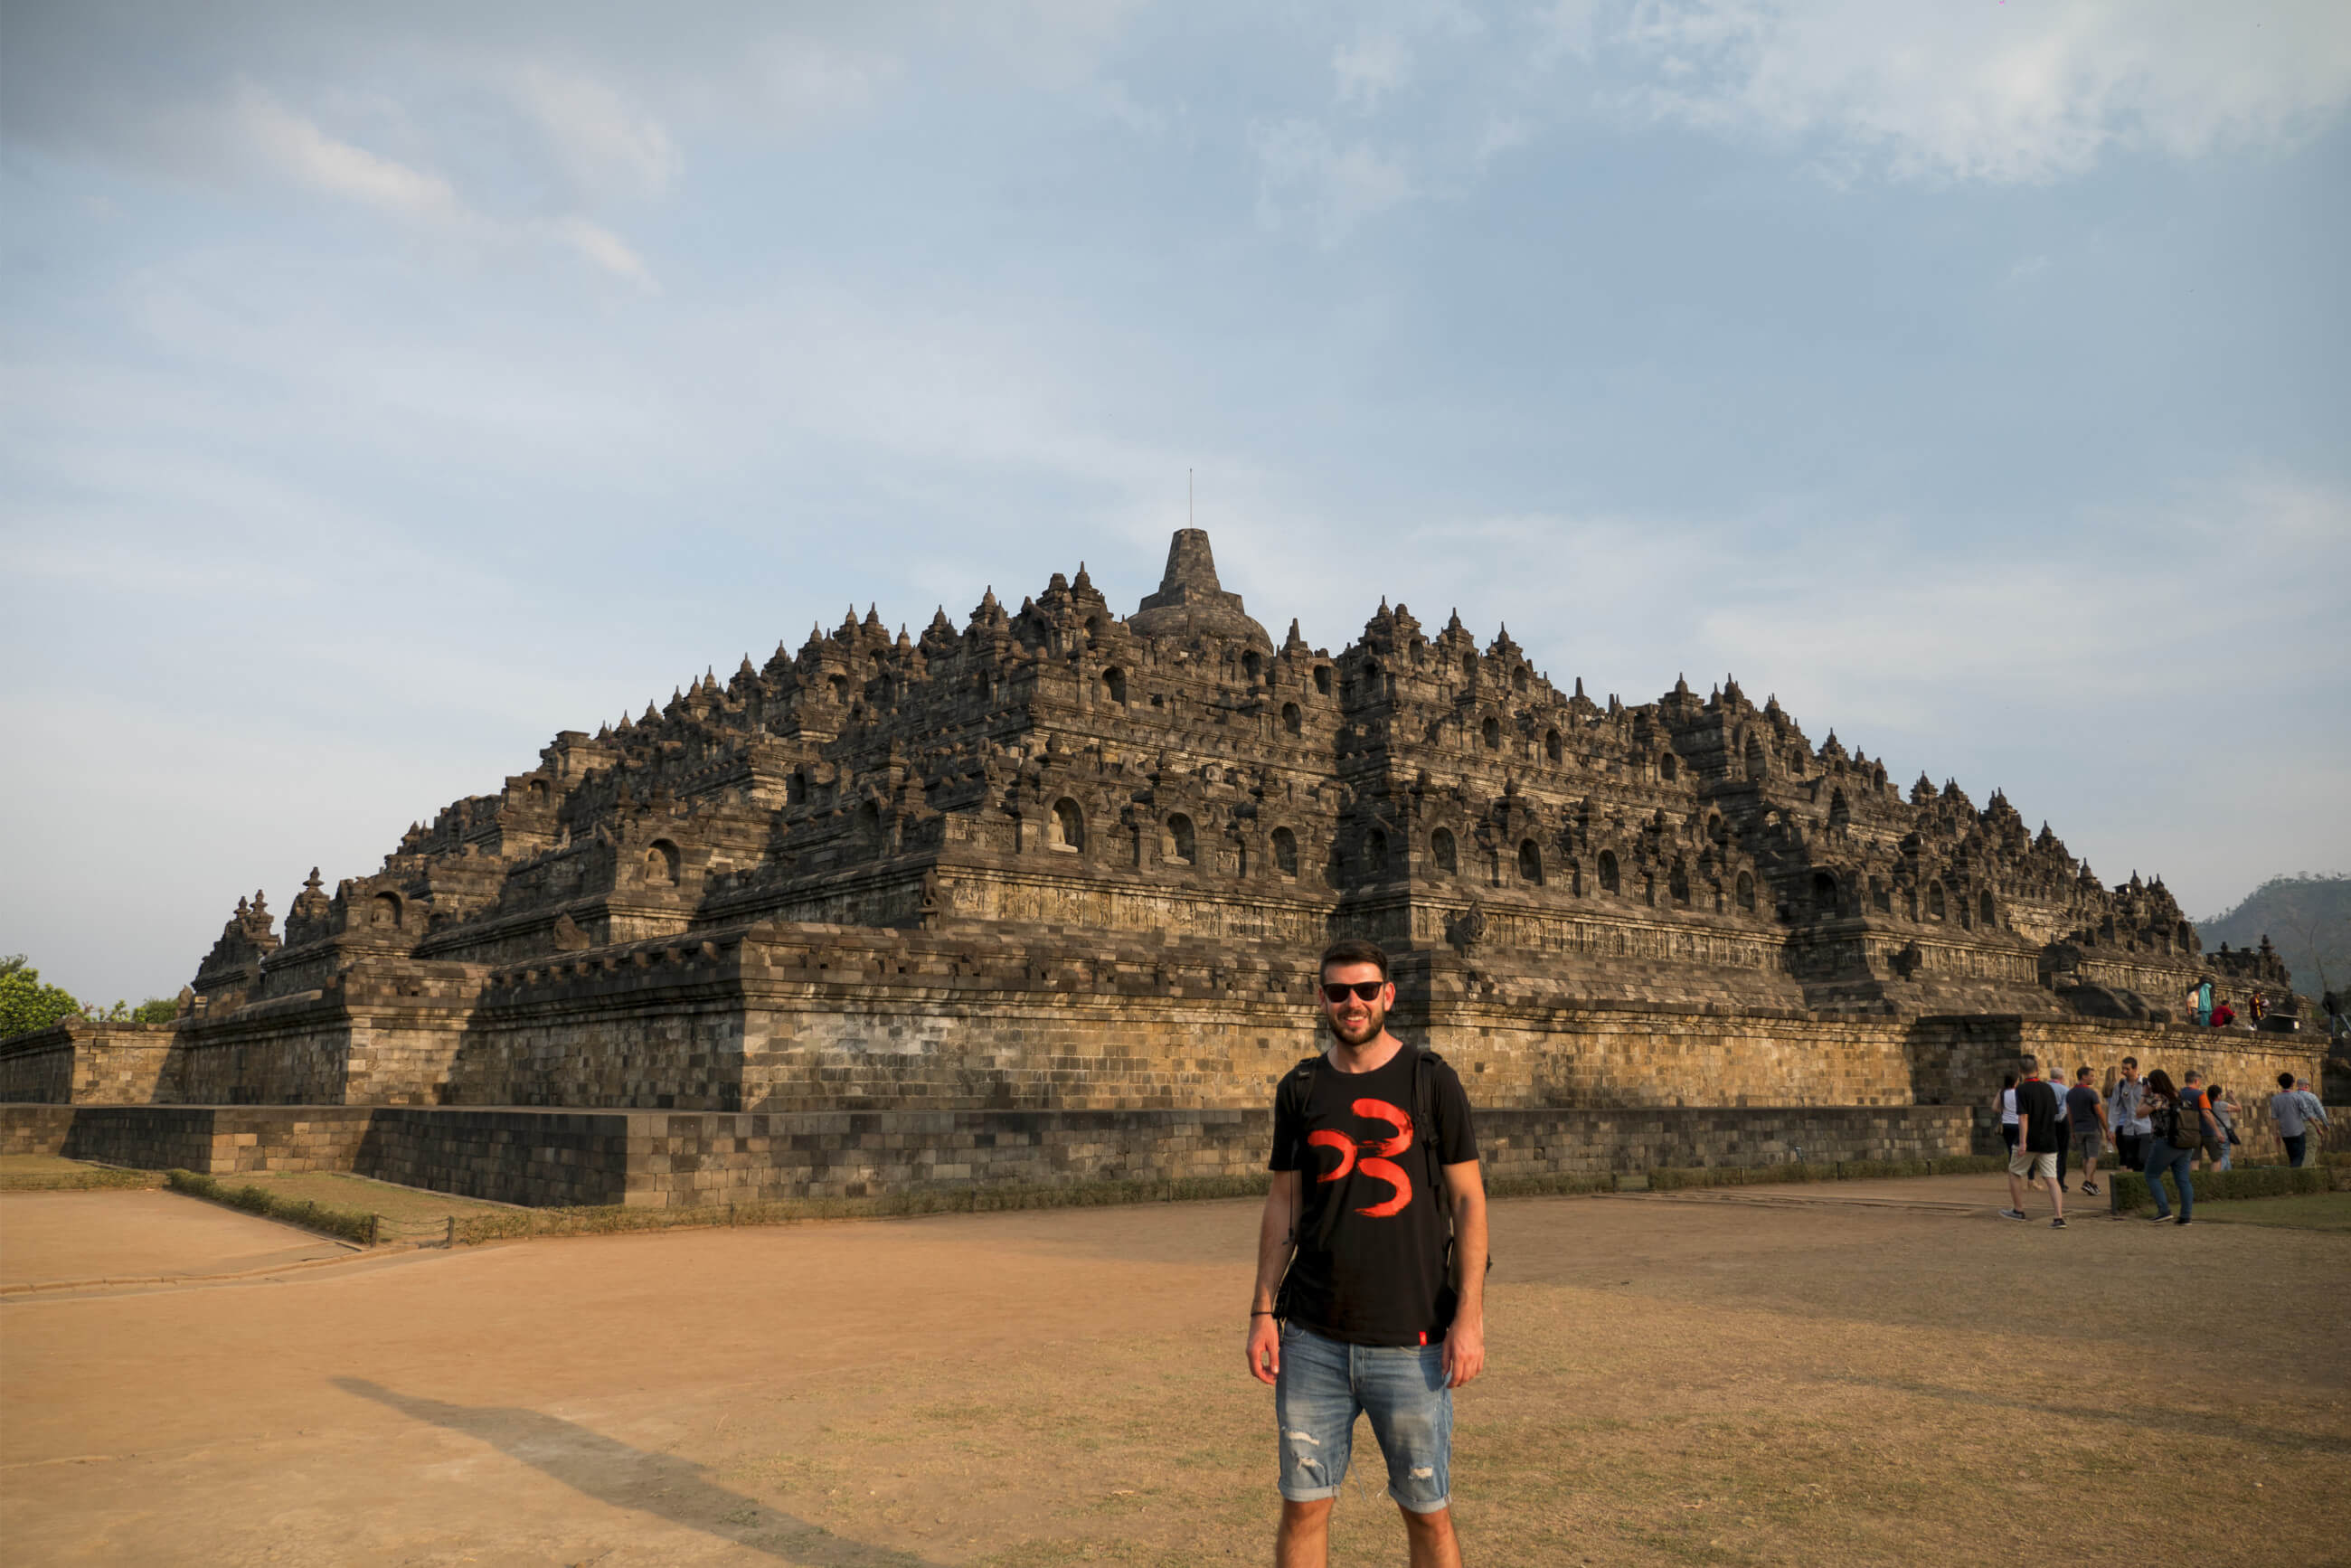 https://bubo.sk/uploads/galleries/7304/martin_simko_indonezia_java_borobudur.jpg